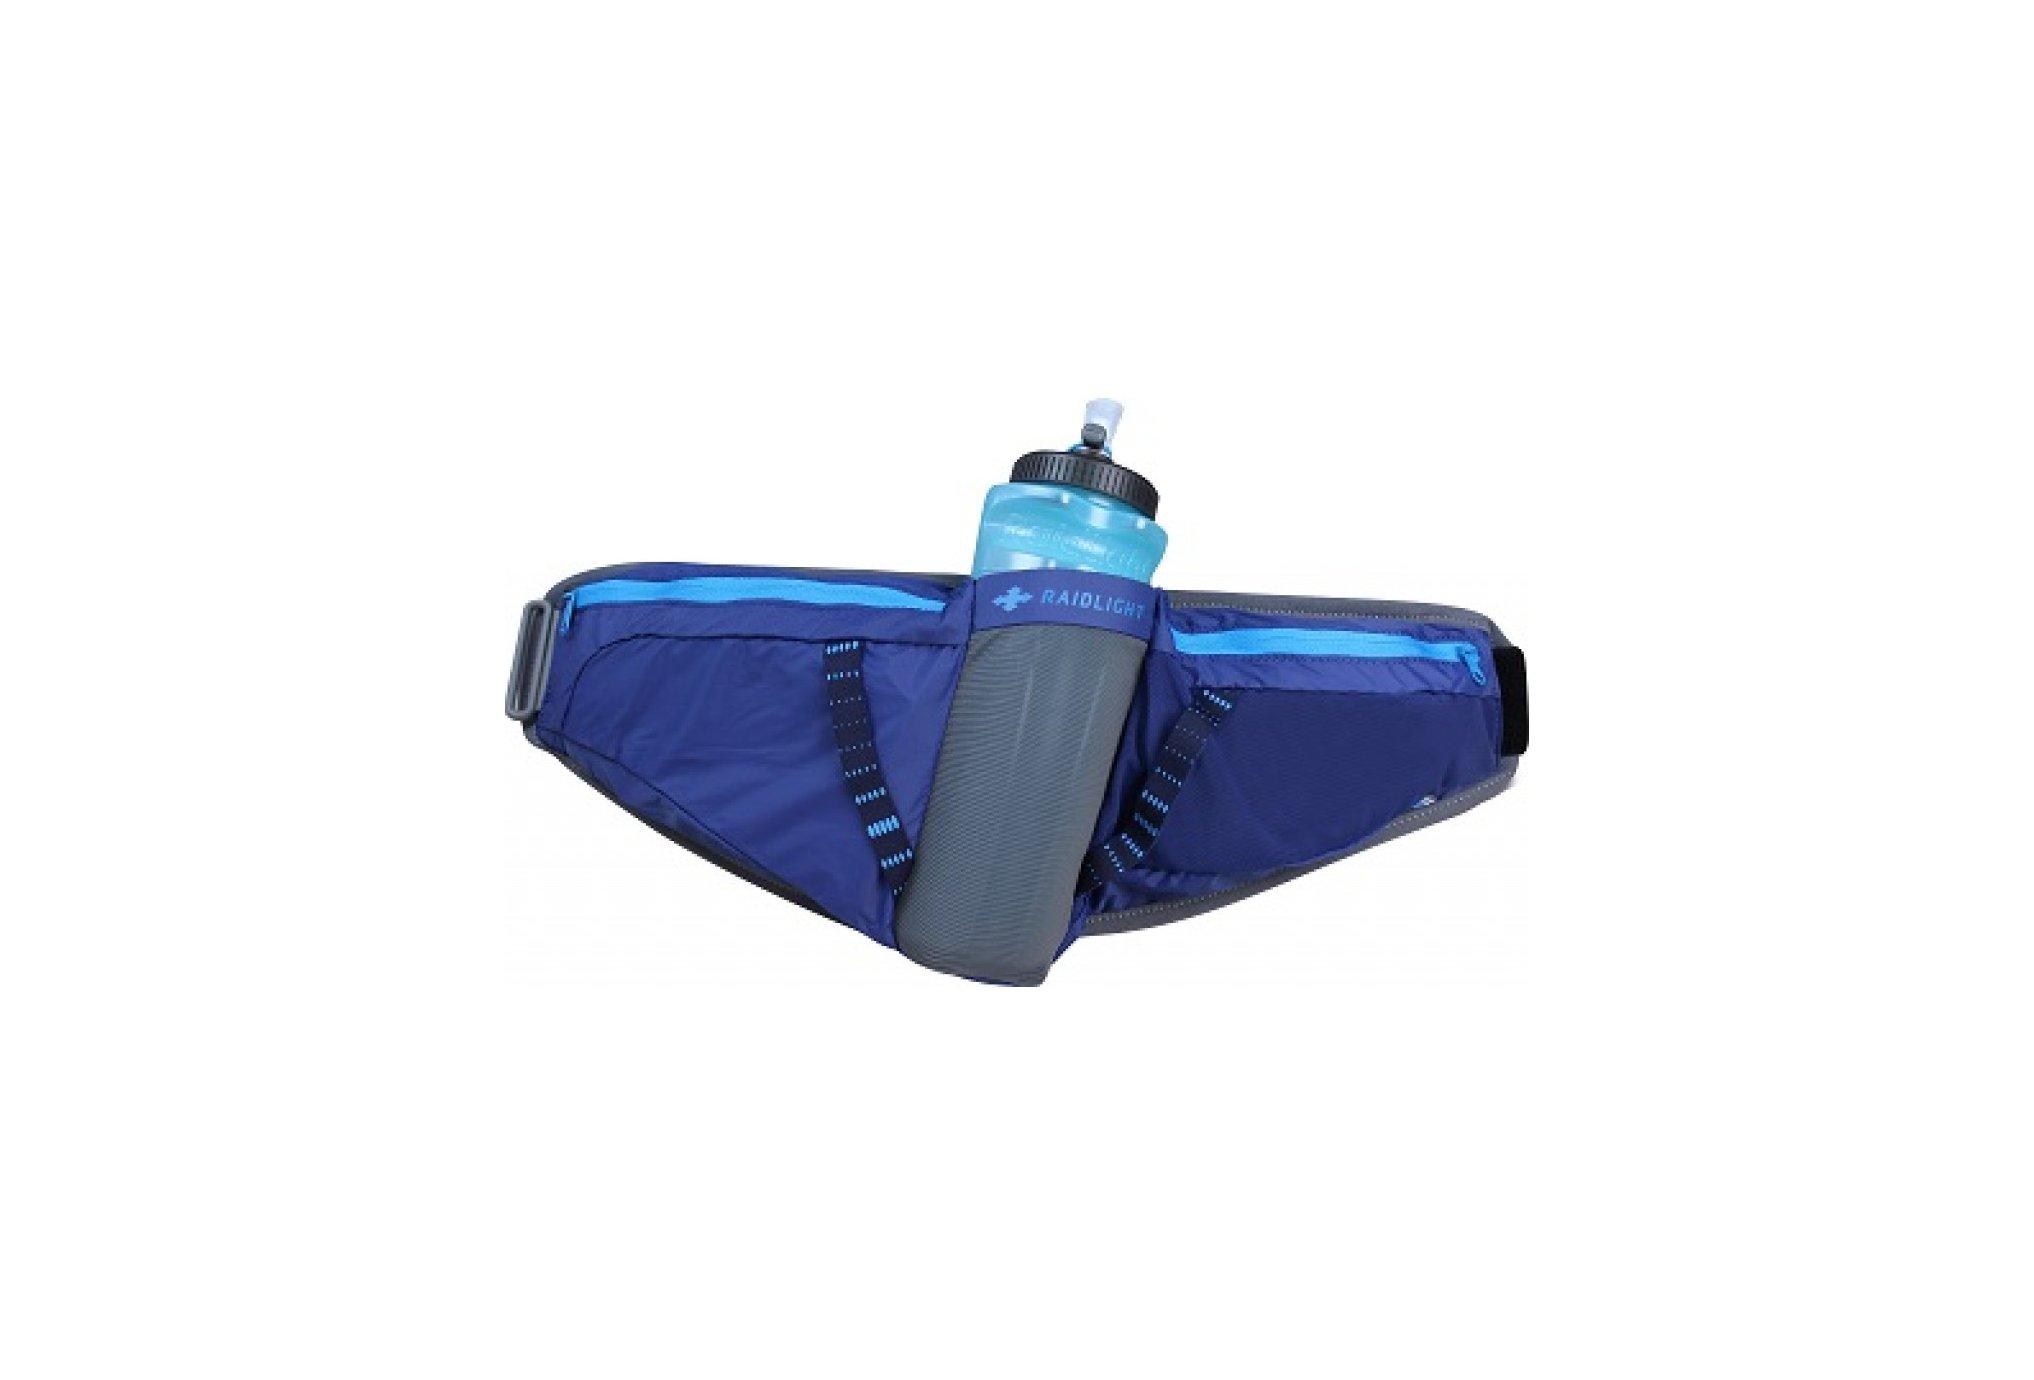 Raidlight Activ 600 Sac hydratation / Gourde